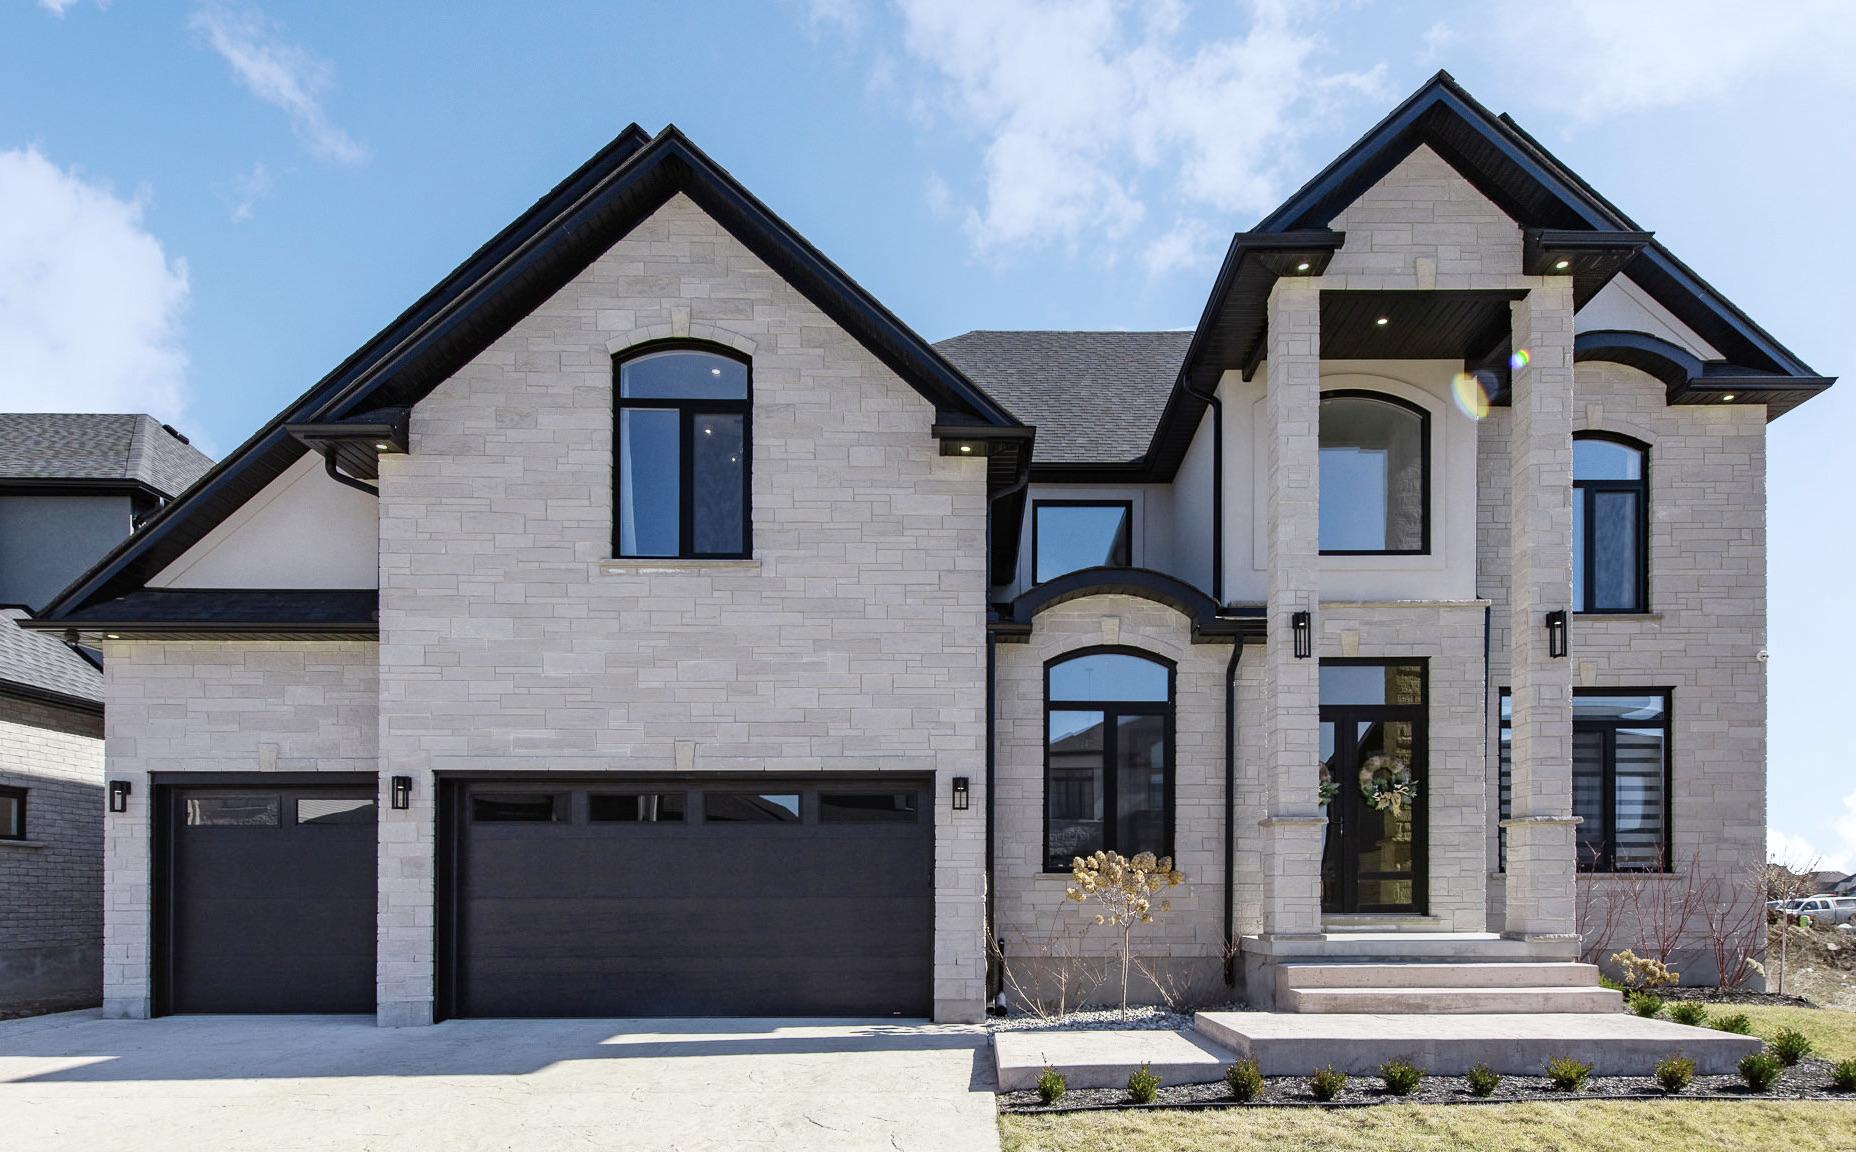 Birchwood homes - home building process